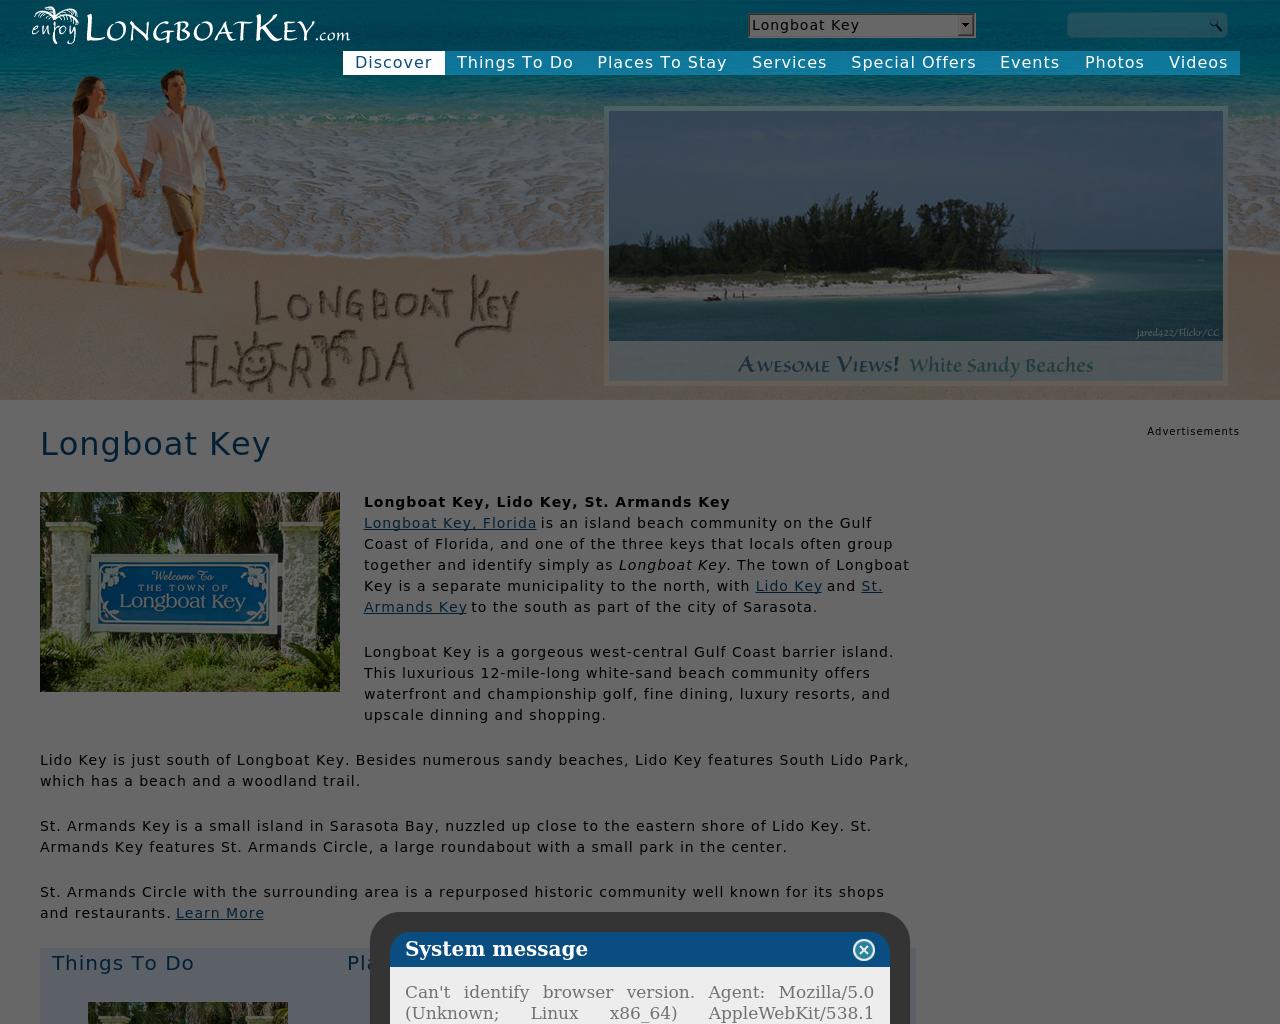 enjoyLongboatKey.com-Advertising-Reviews-Pricing